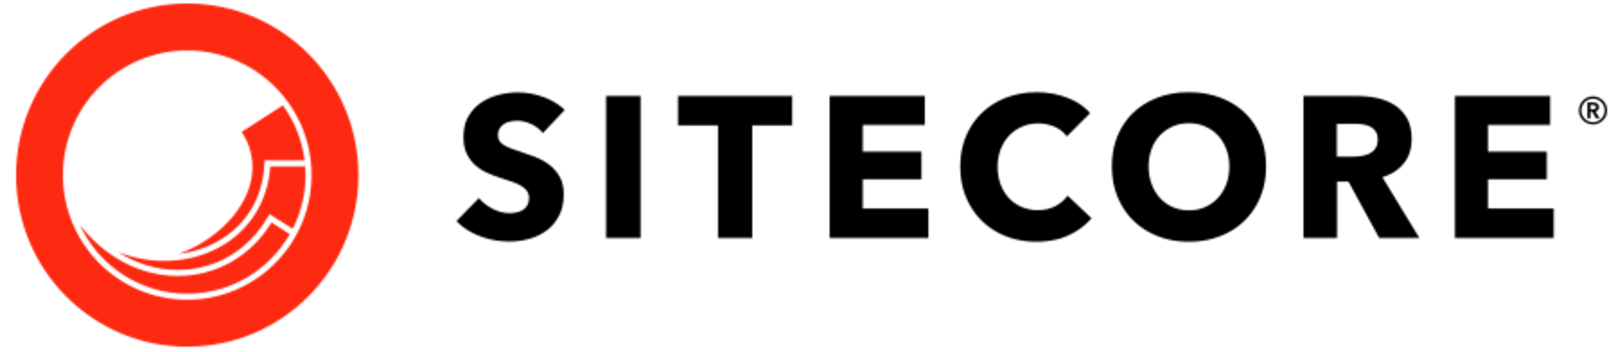 406025